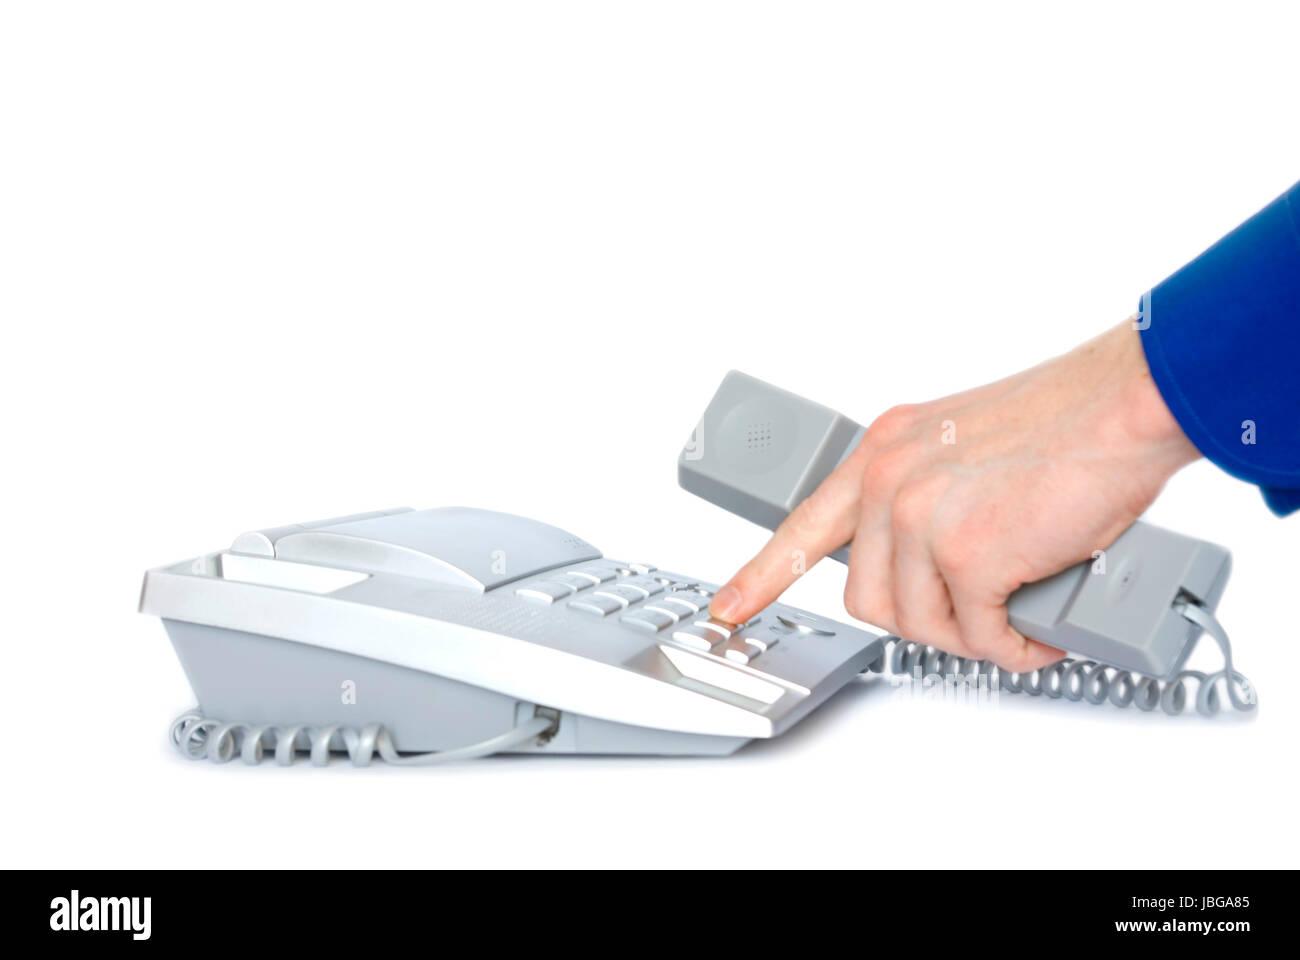 Finger presses figure on phone - Stock Image